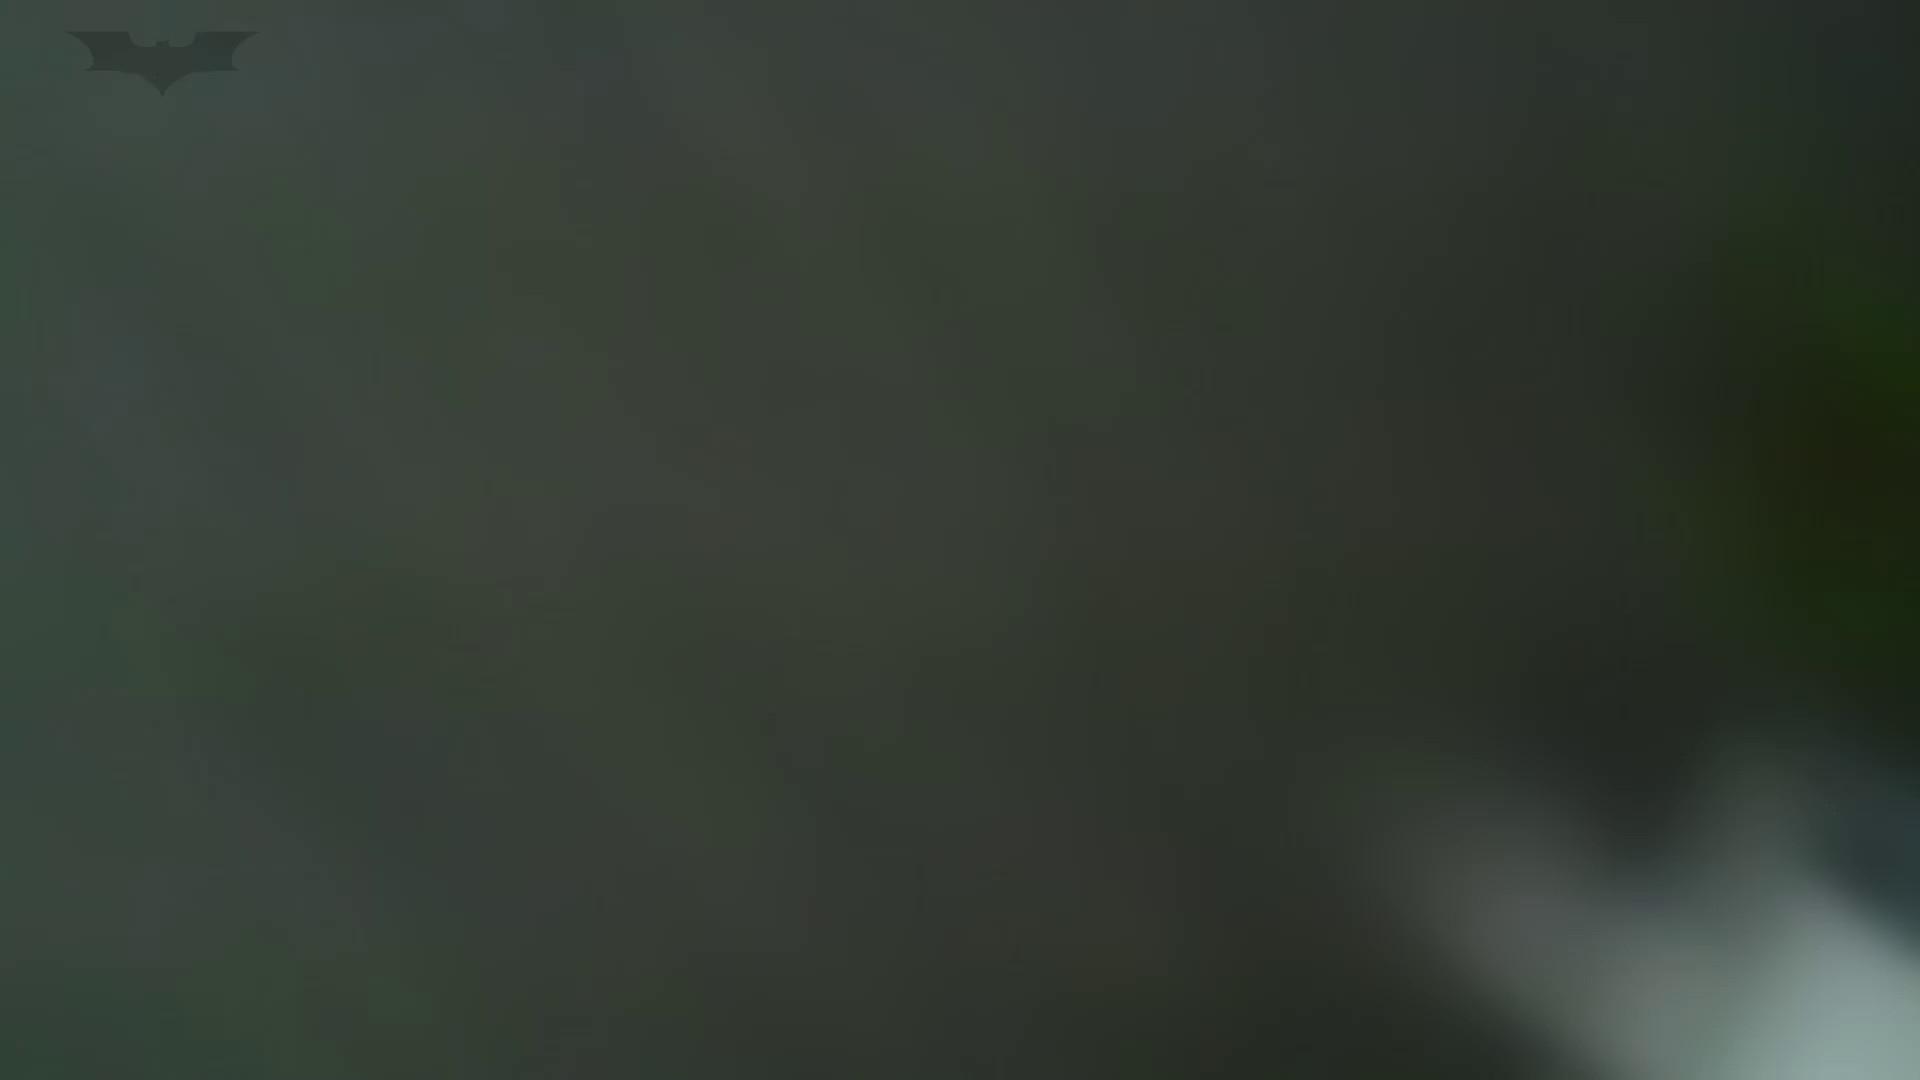 化粧室絵巻 番外編 VOL.14 高画質動画 おめこ無修正動画無料 75画像 38